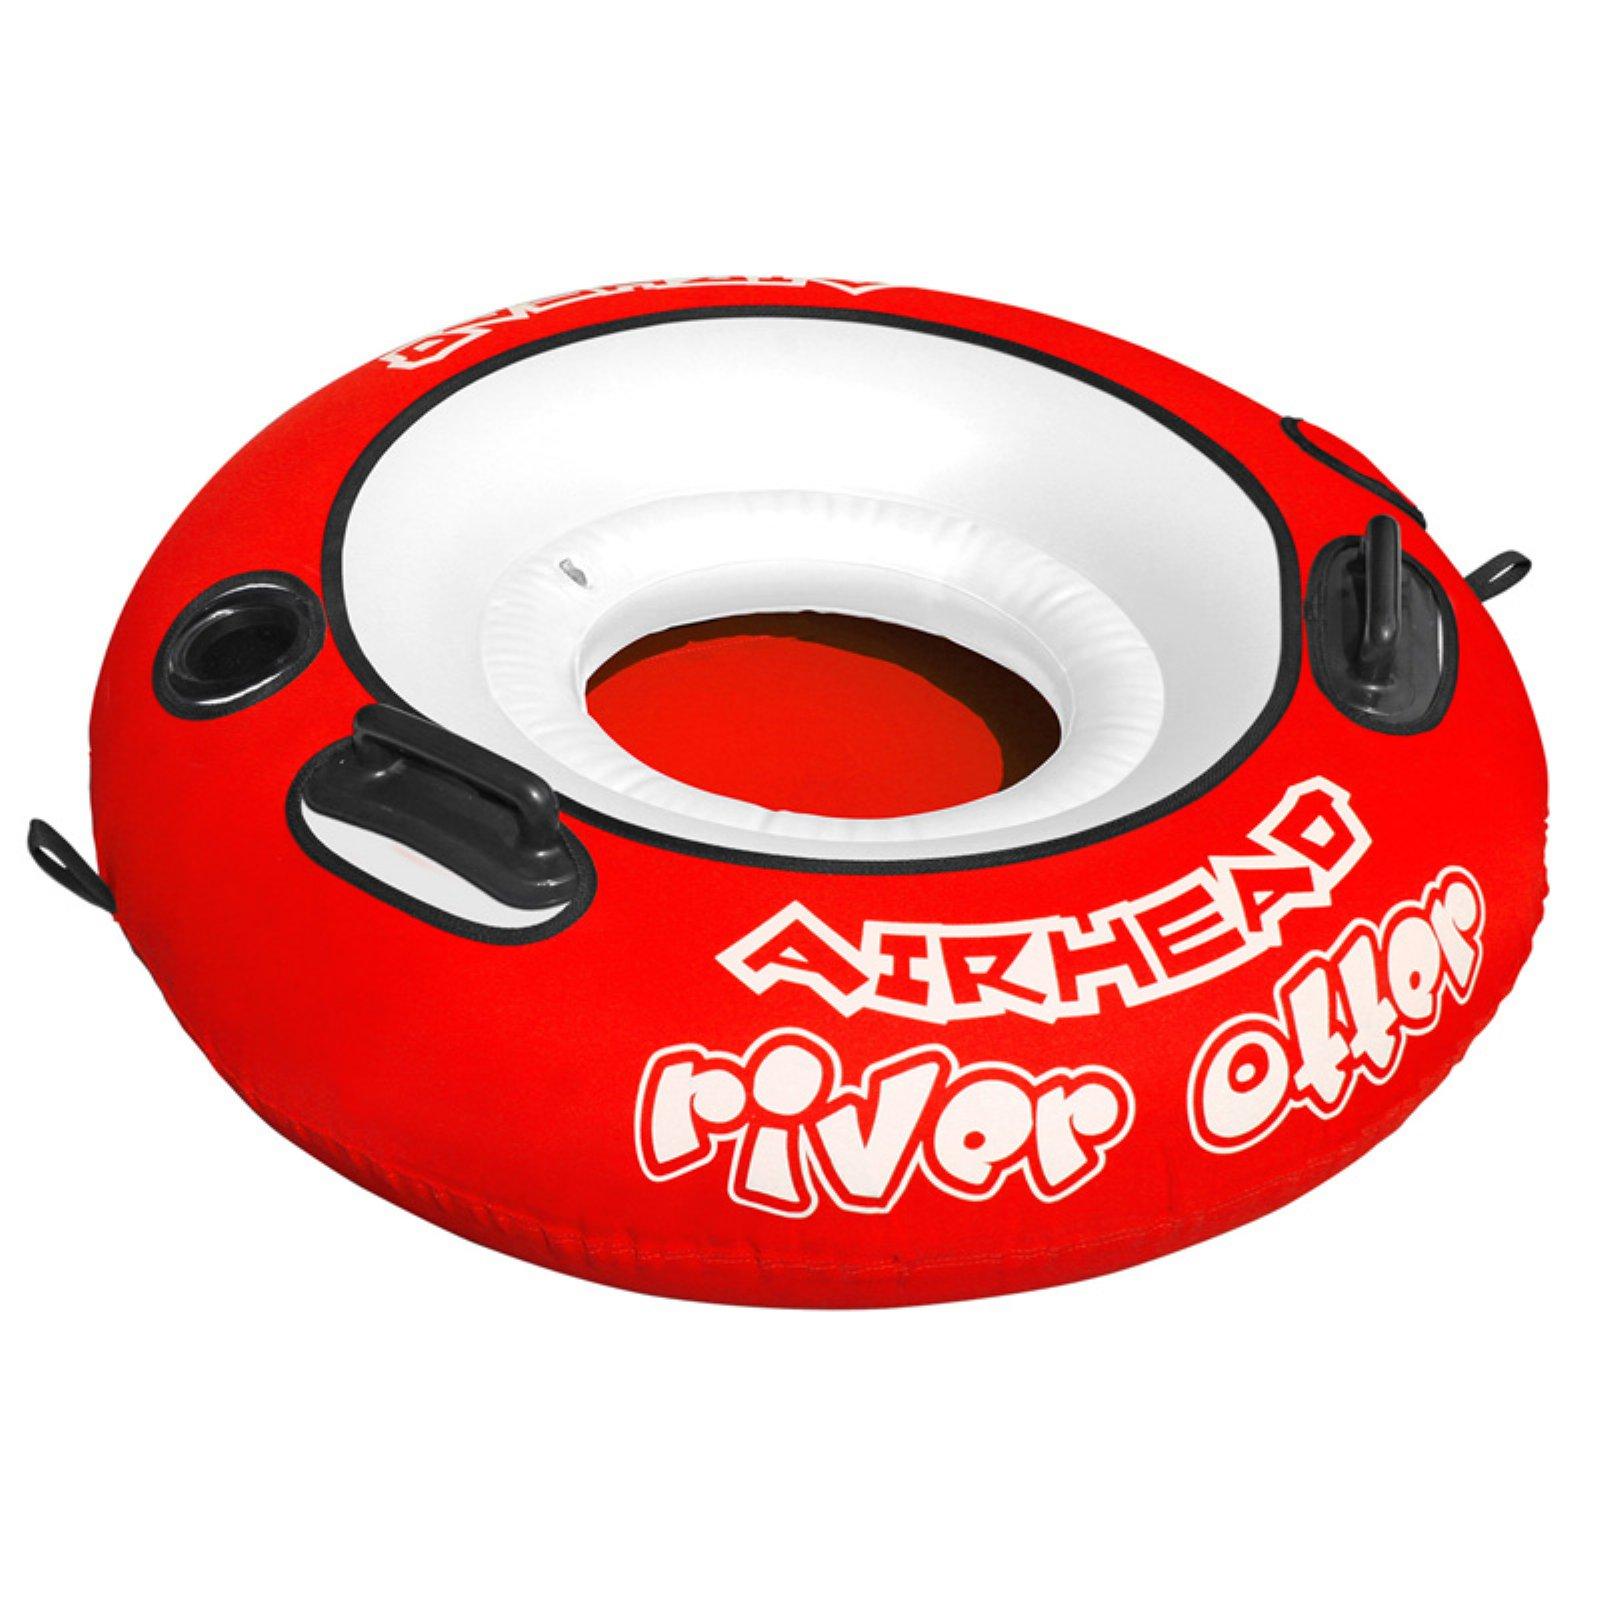 Airhead River Otter Covered Tube Pool Float